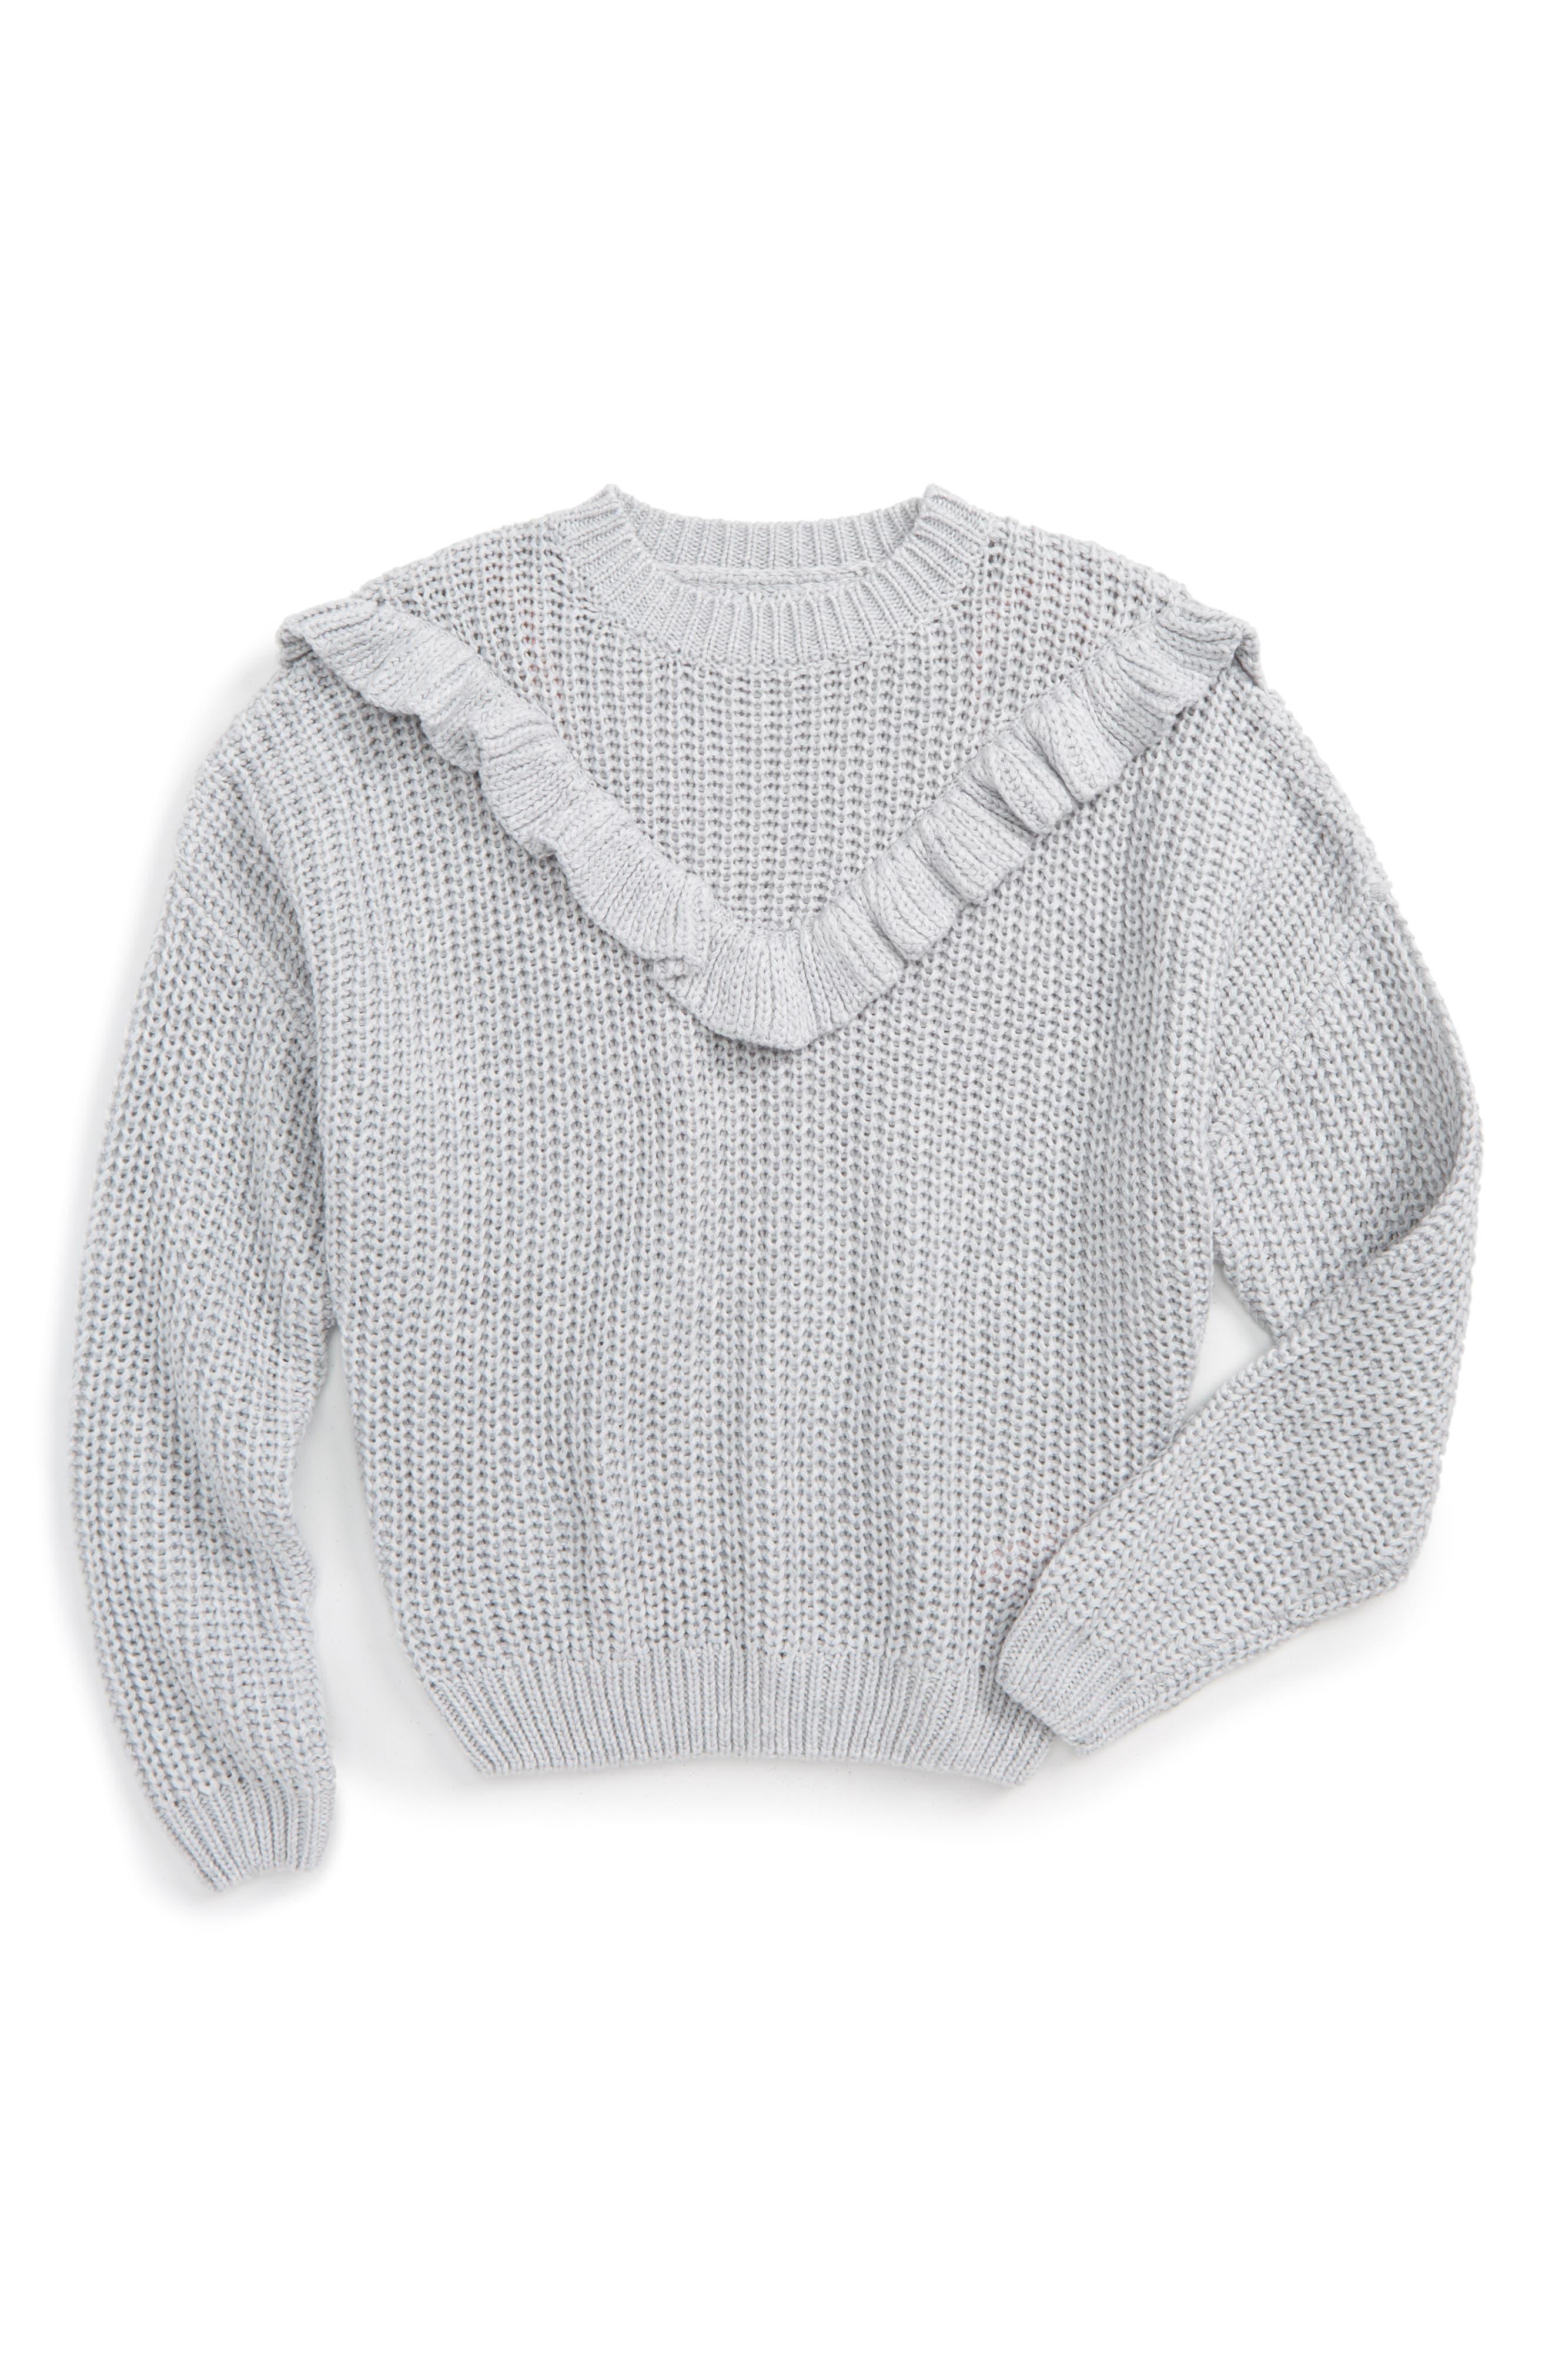 BLANCNYC Ruffle Sweater,                             Main thumbnail 2, color,